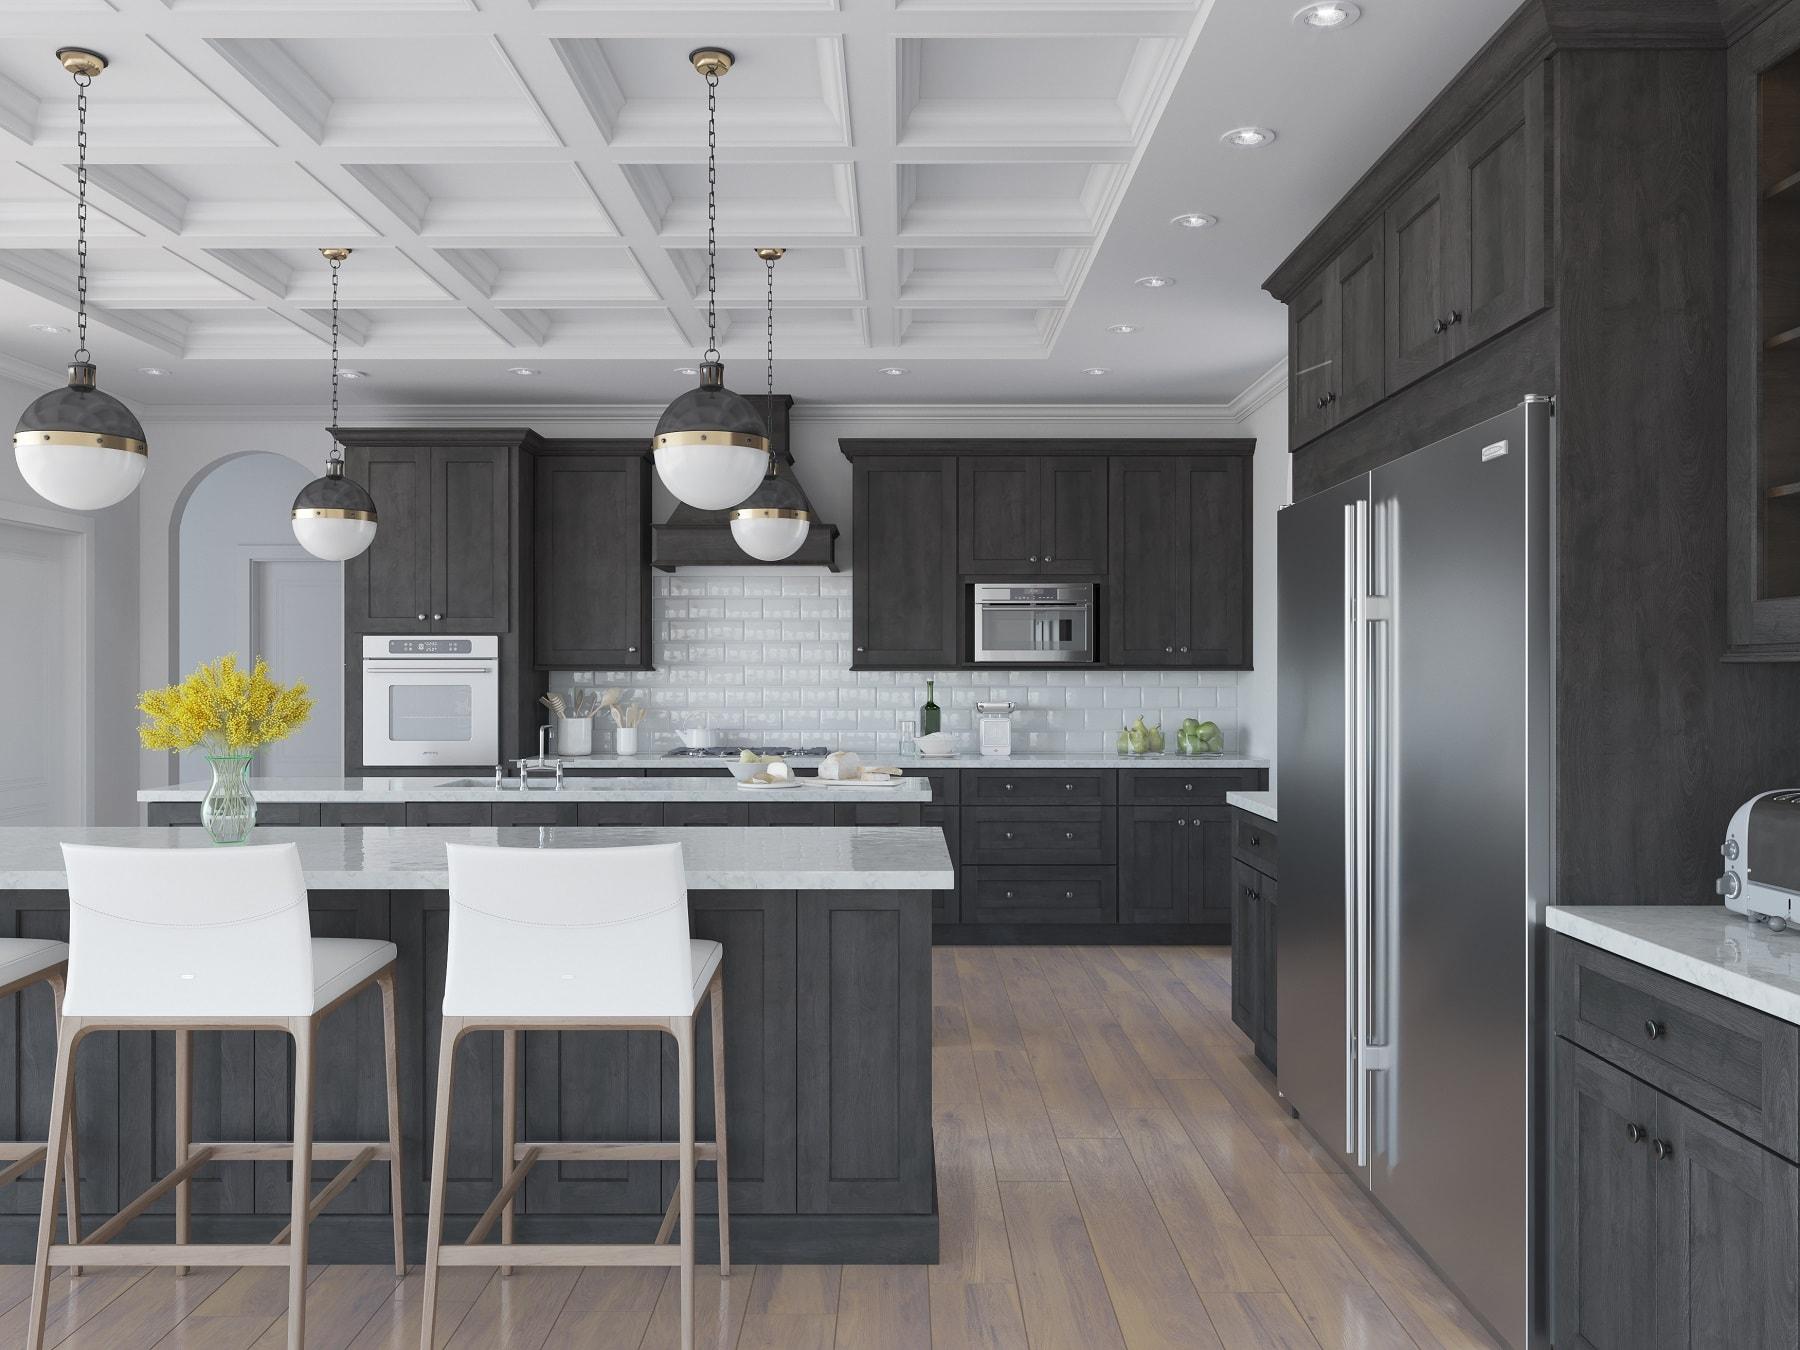 Best Kitchen Gallery: Natural Grey Shaker Ready To Assemble Kitchen Cabi S Kitchen of Kitchen Cabinets Grey on rachelxblog.com